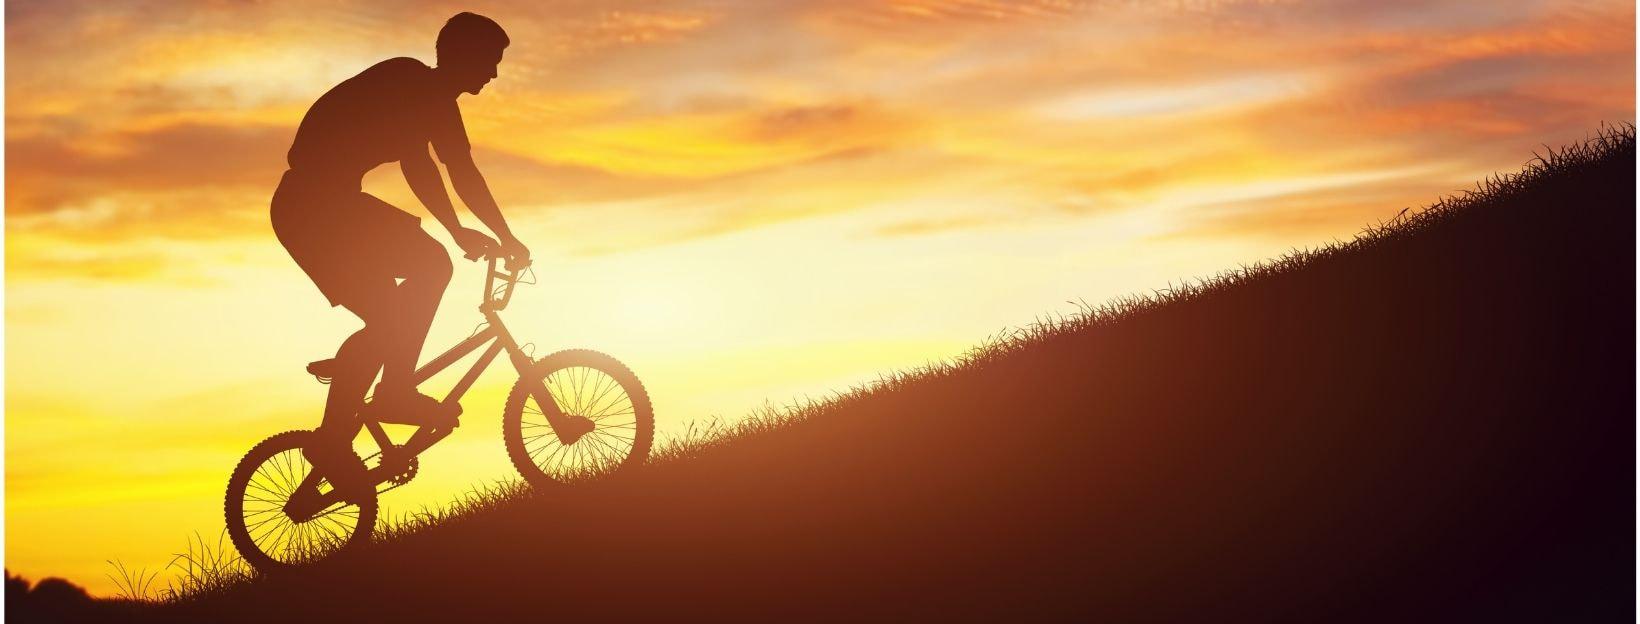 BANNER-Canva-MADatBDrSFc-man-riding-a-bmx-bike-uphill-against-sunset-sky-strength-challenge-2